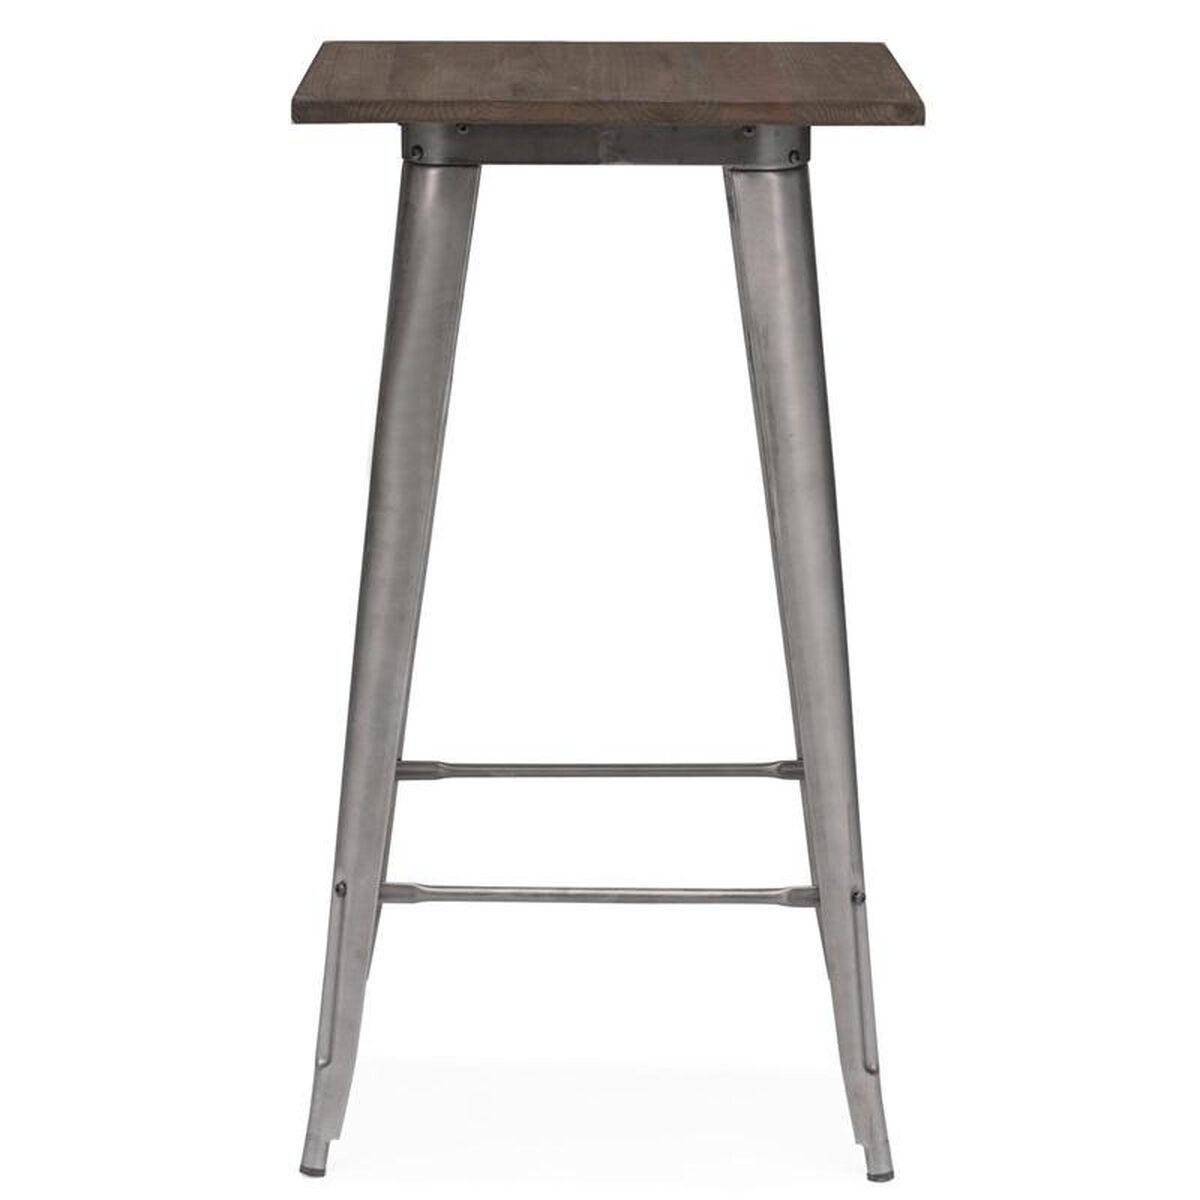 Dreux Gunmetal Steel Bar Table Restaurantfurniture4less Com